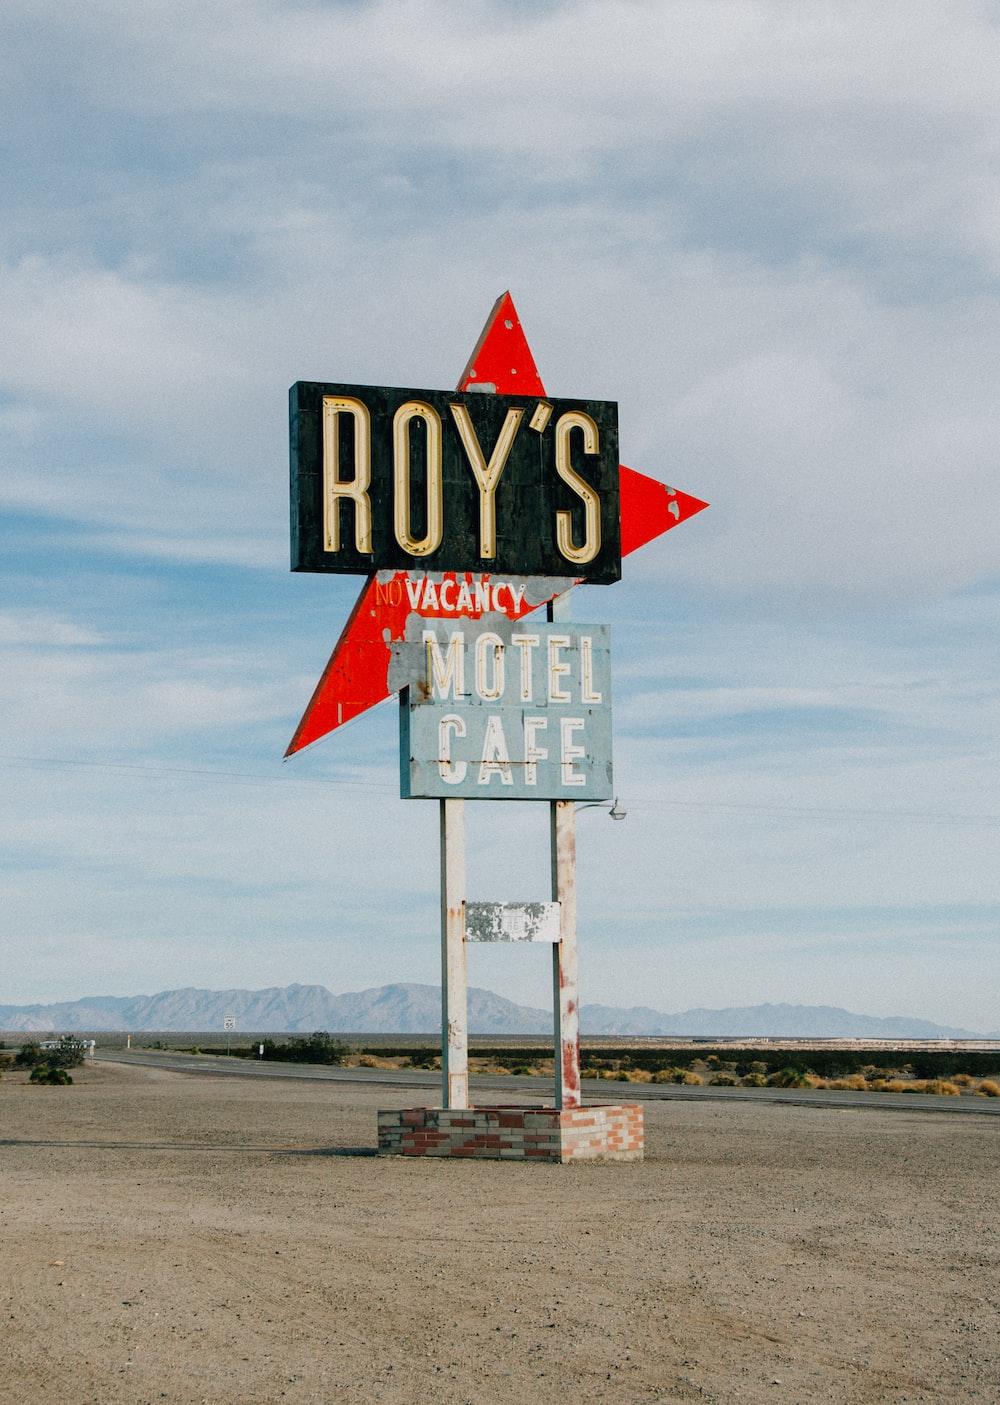 black and gray Royś motel cafe signage